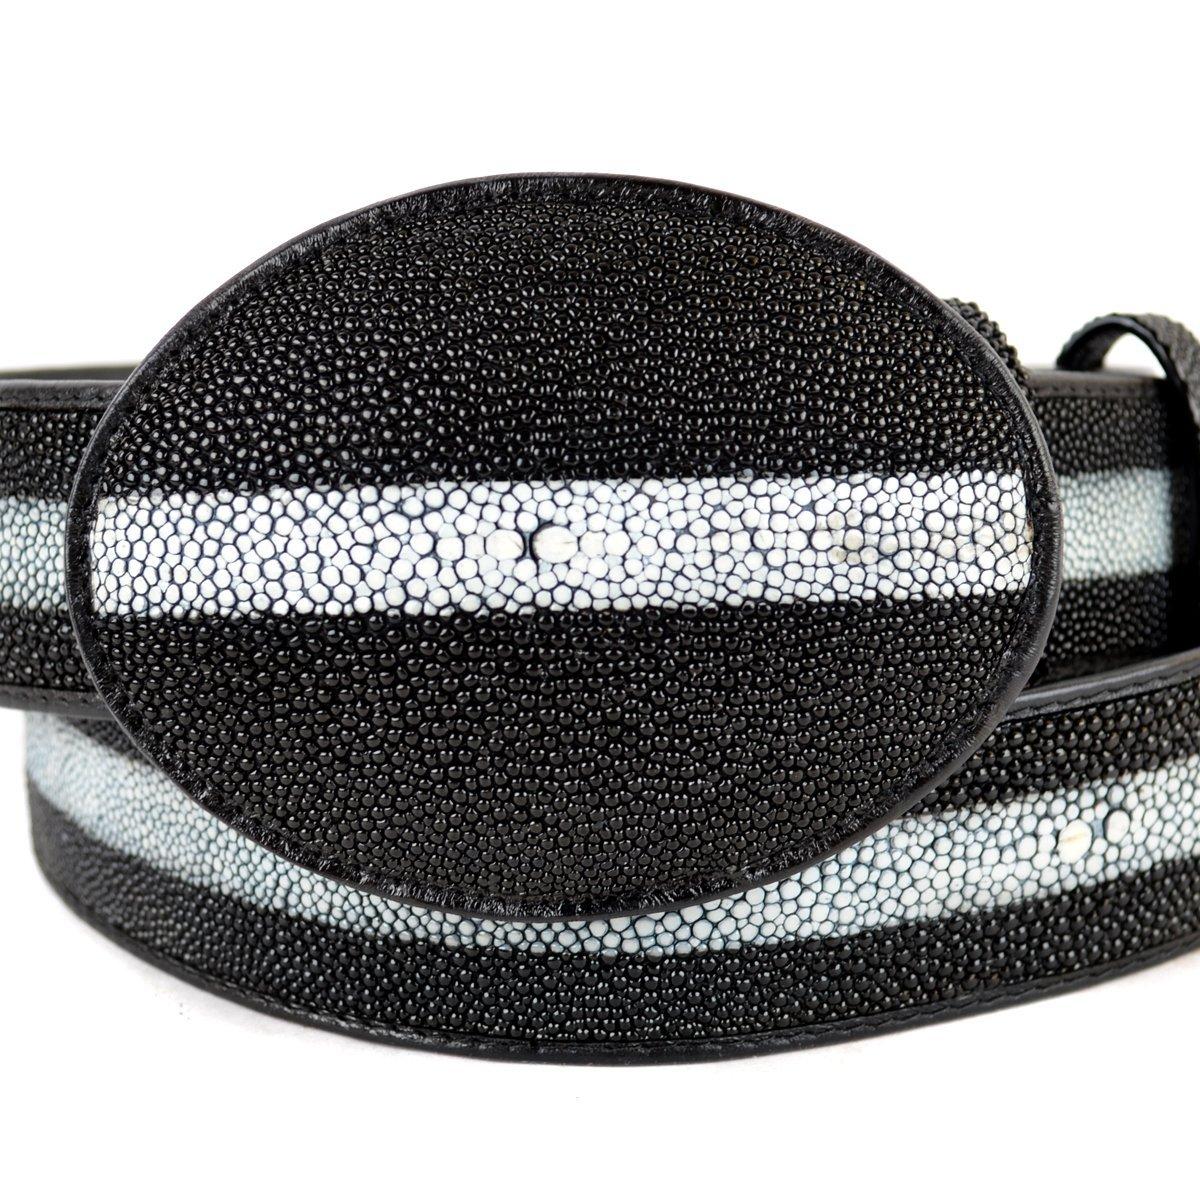 Original Black Rowstone Finish StingRay Skin Western Style Belt